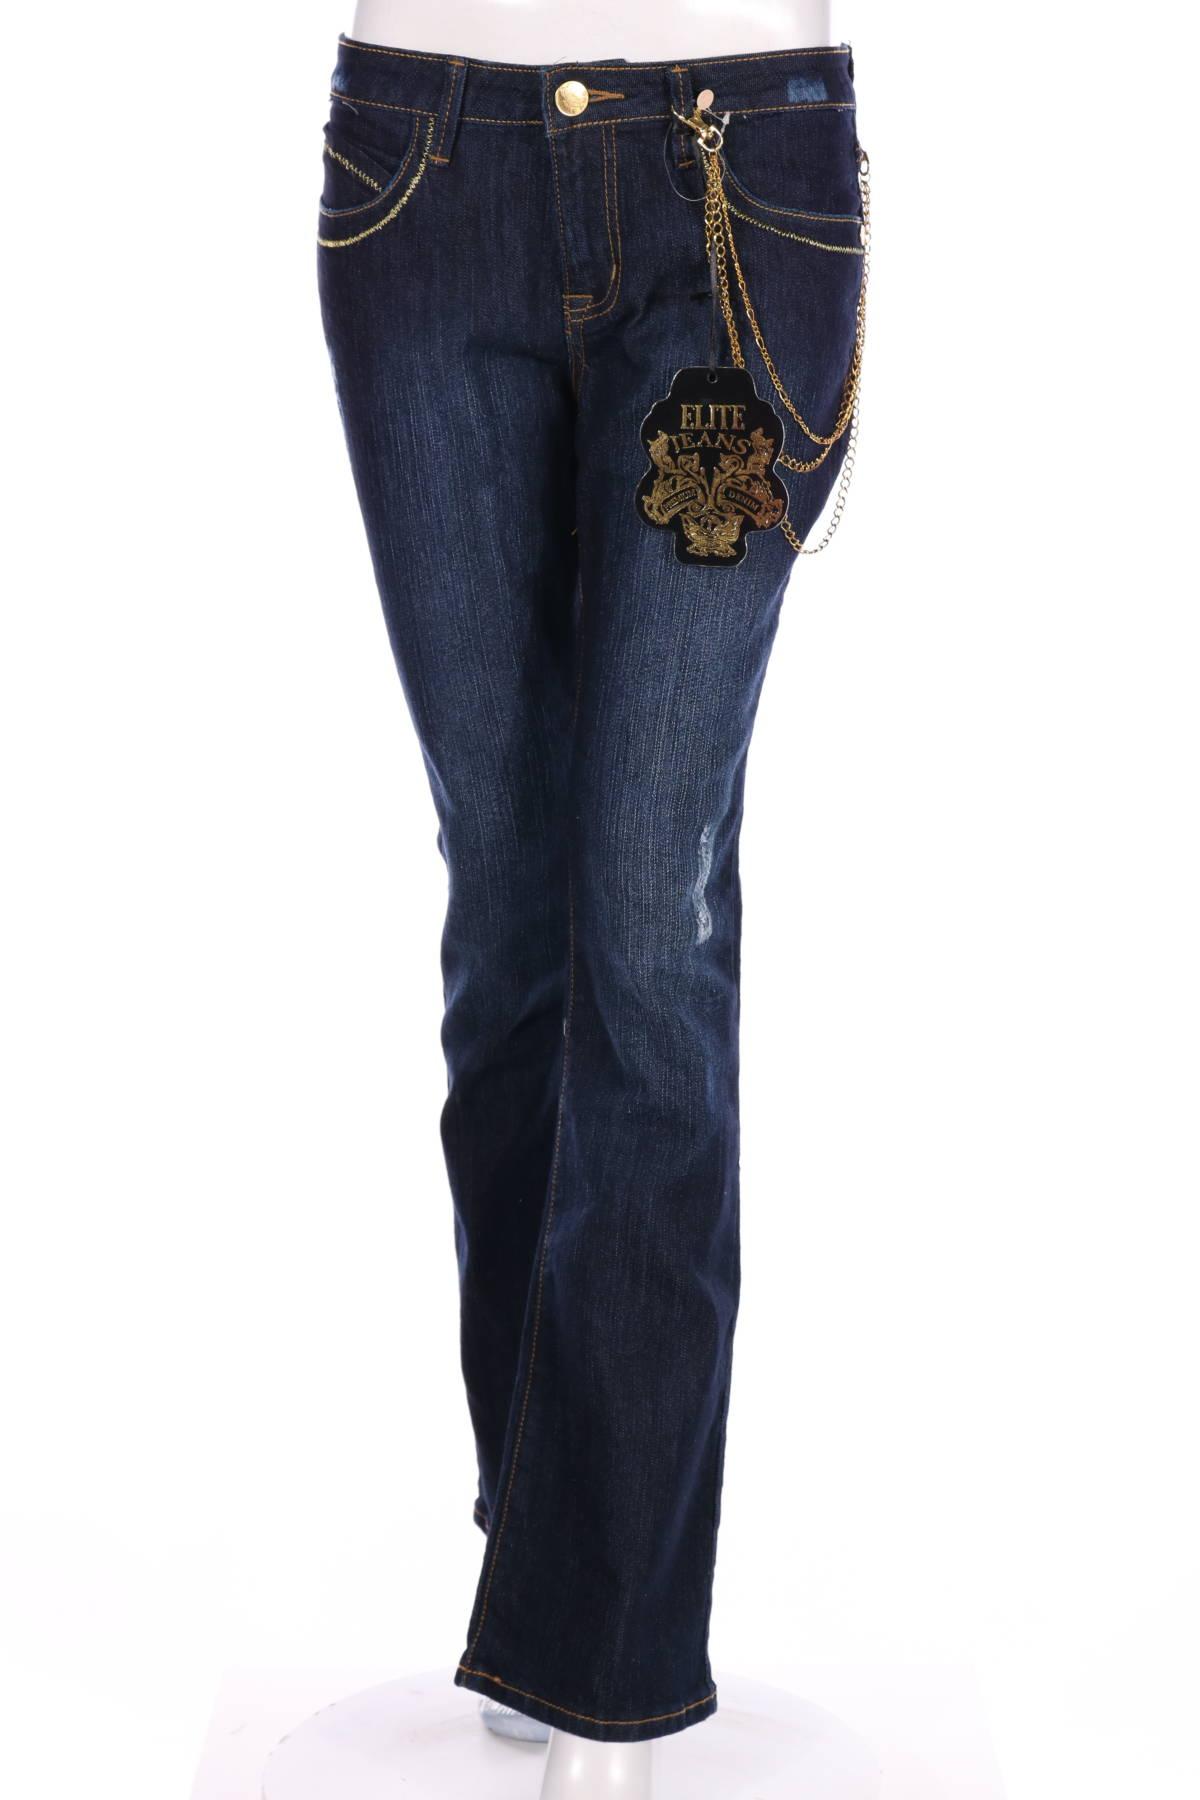 Дънки Elite jeans1